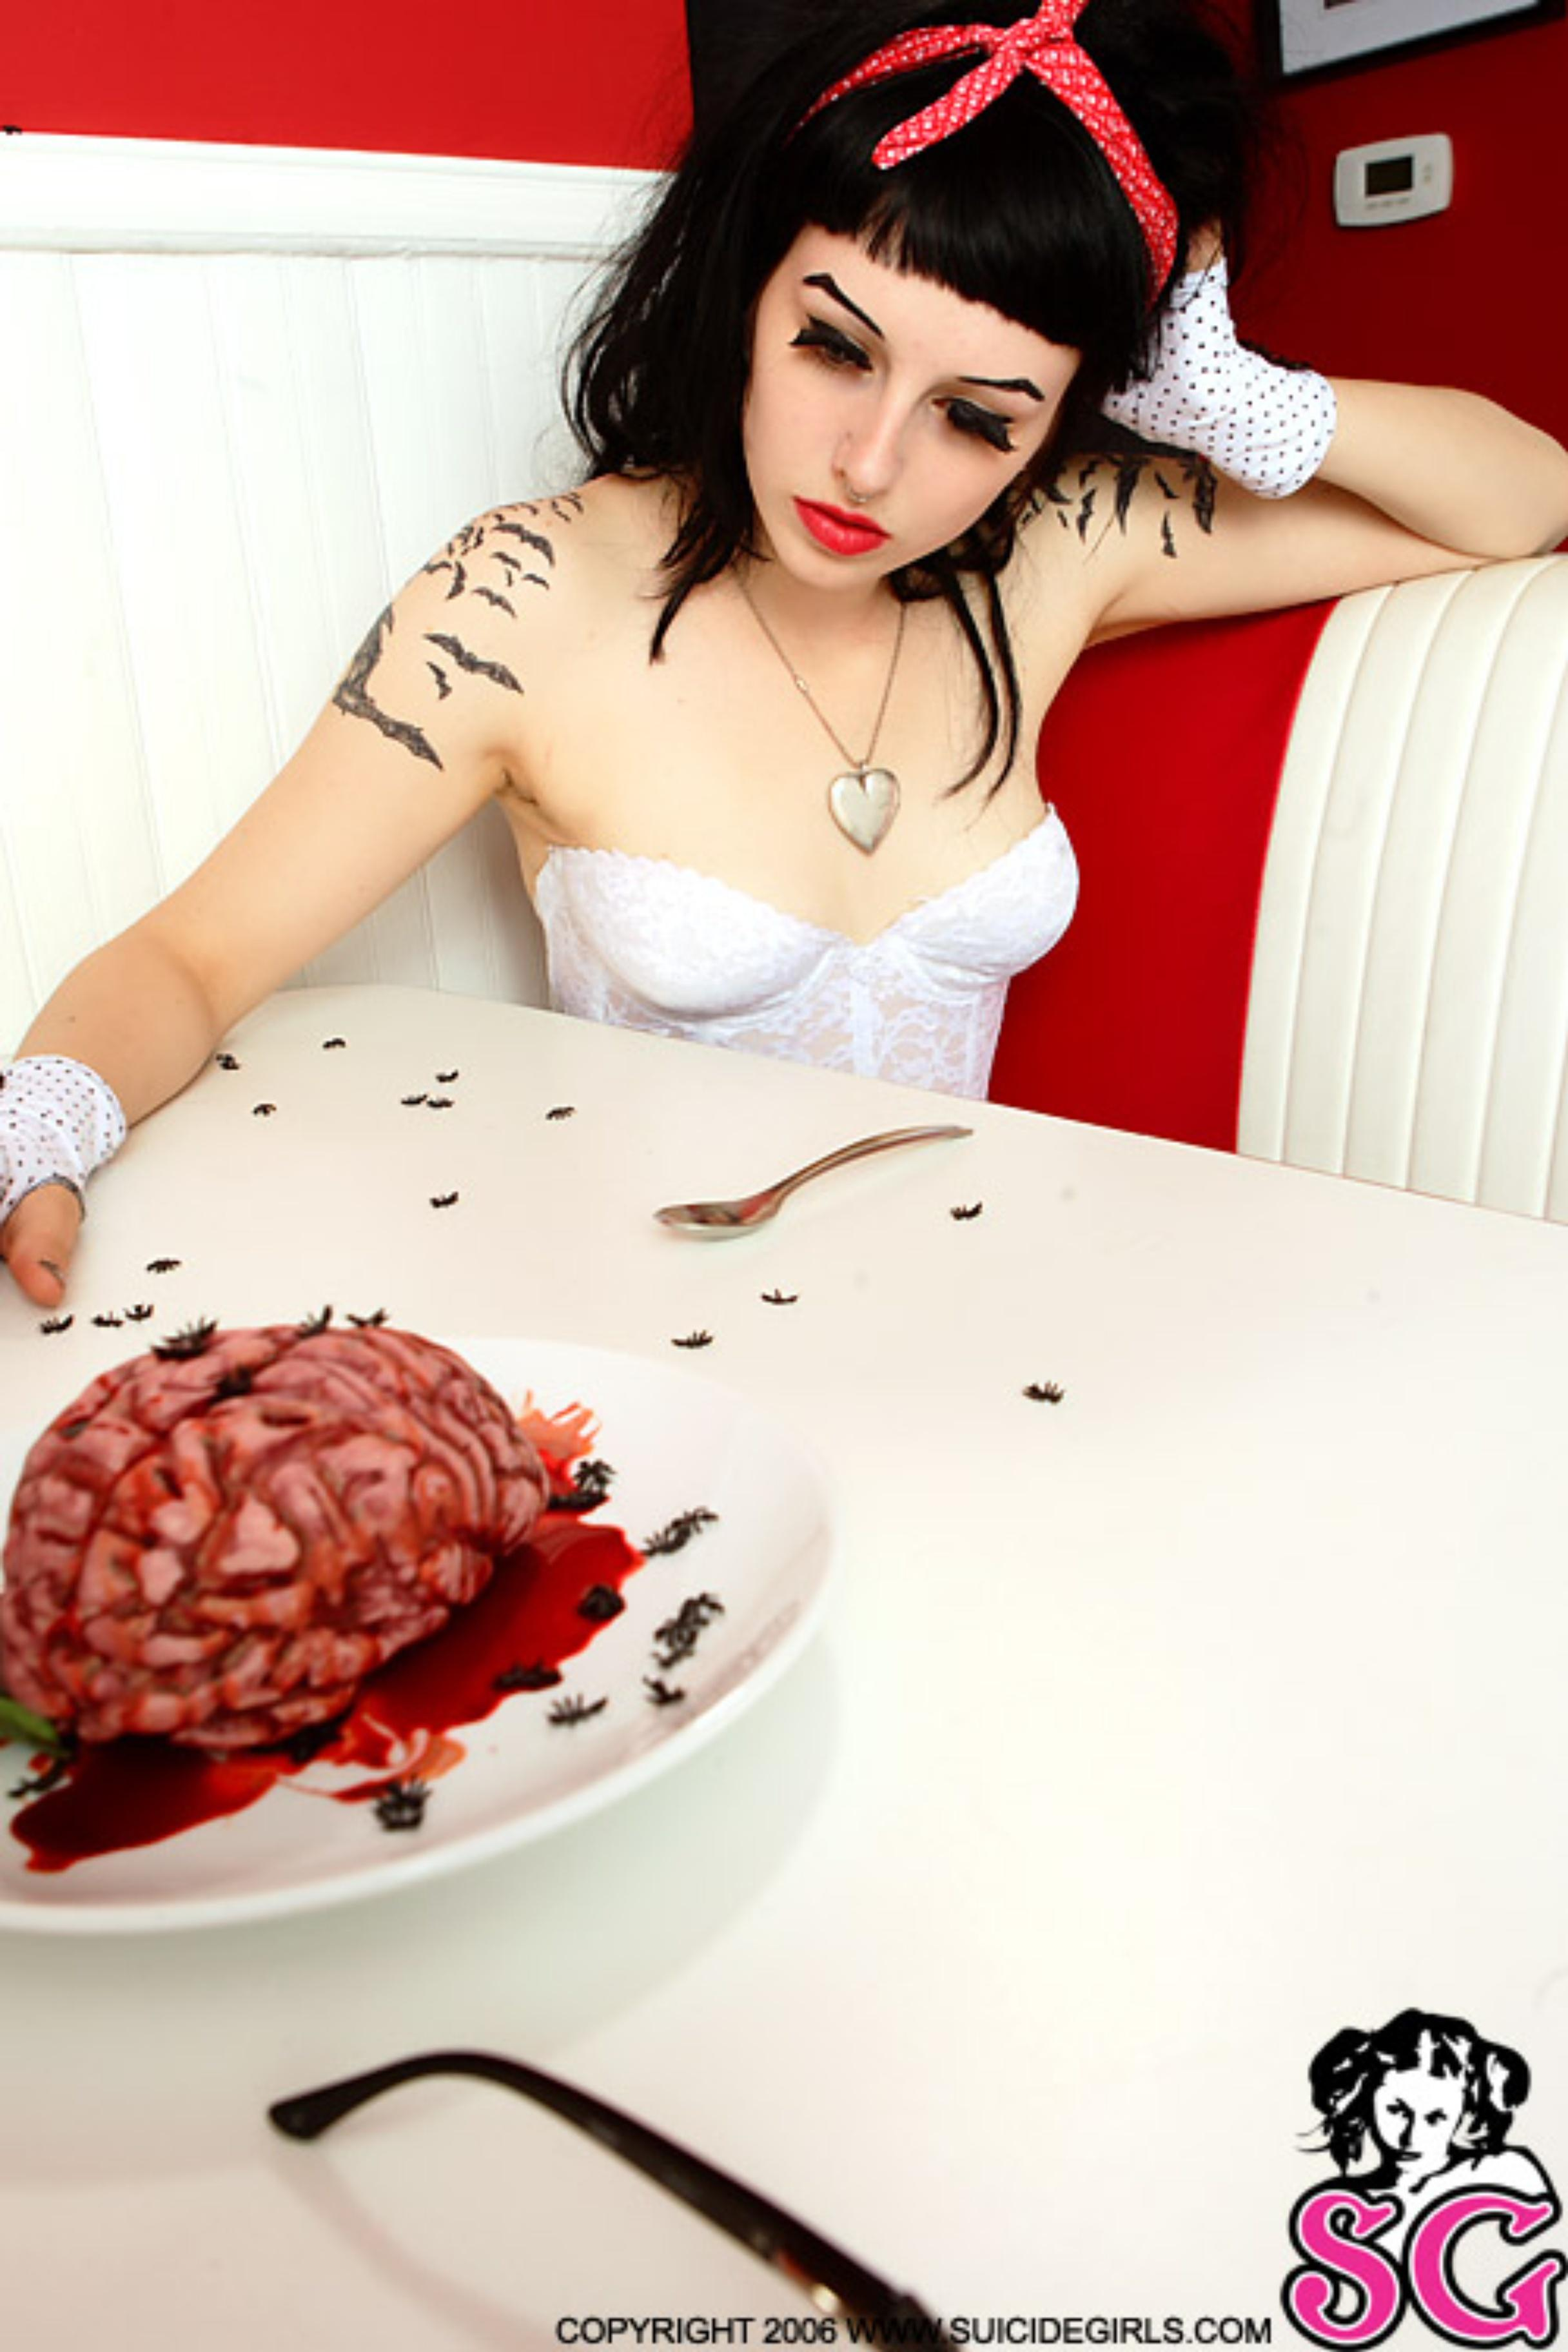 Фото девушек без мозгов